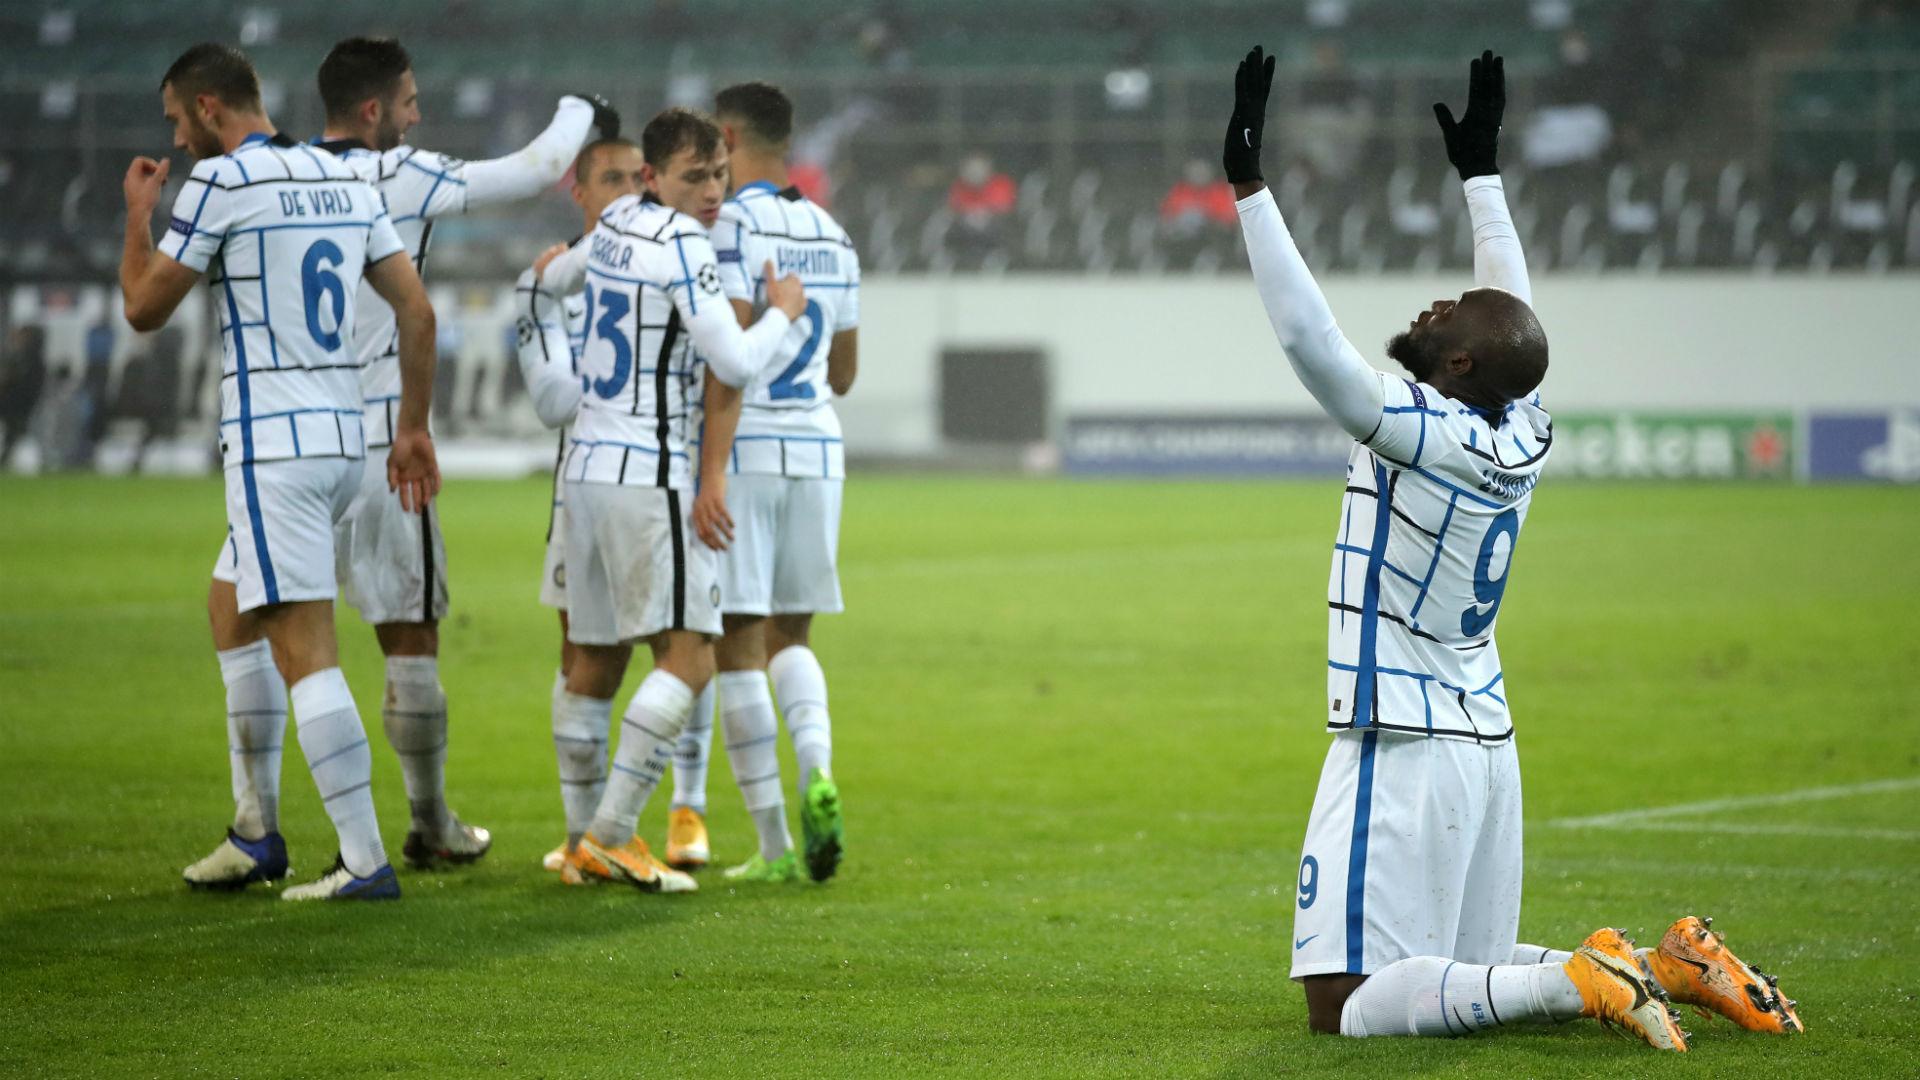 Borussia Monchengladbach 2-3 Inter: Romelu Lukaku double keeps Nerazzurri